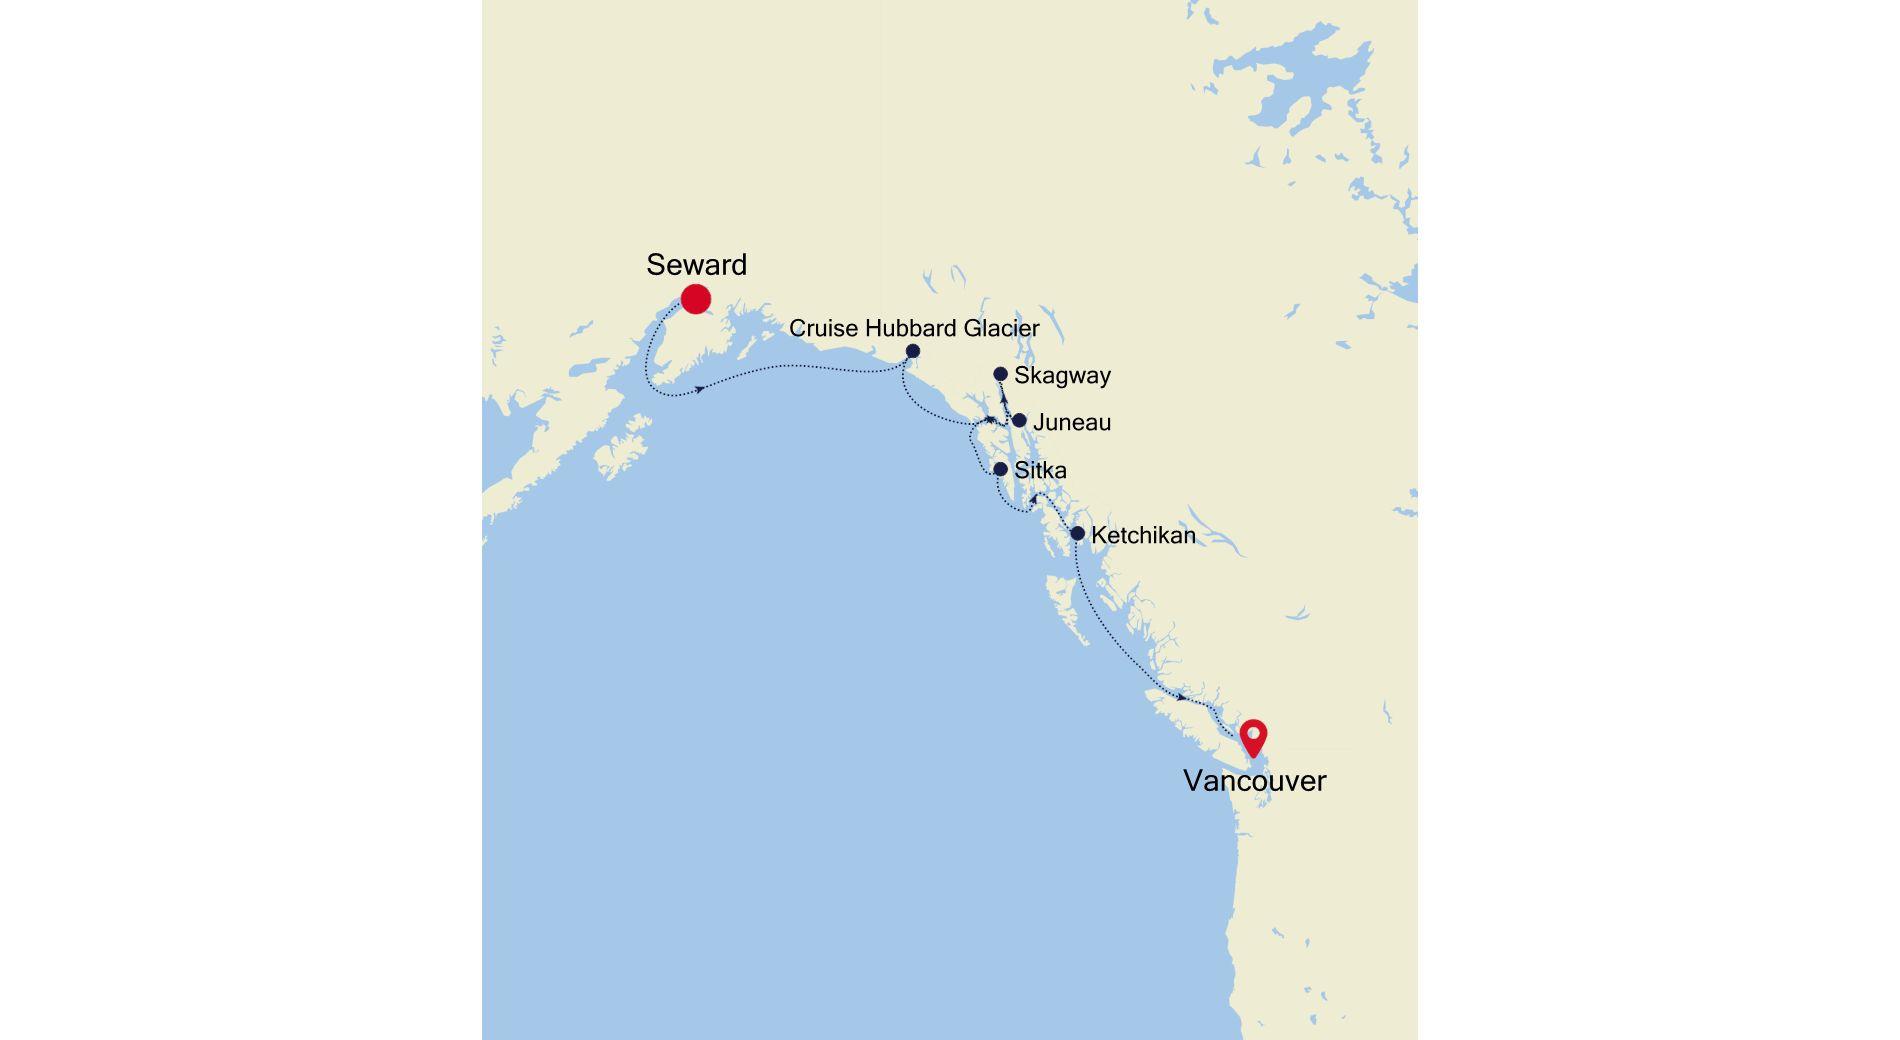 6915 - Seward nach Vancouver